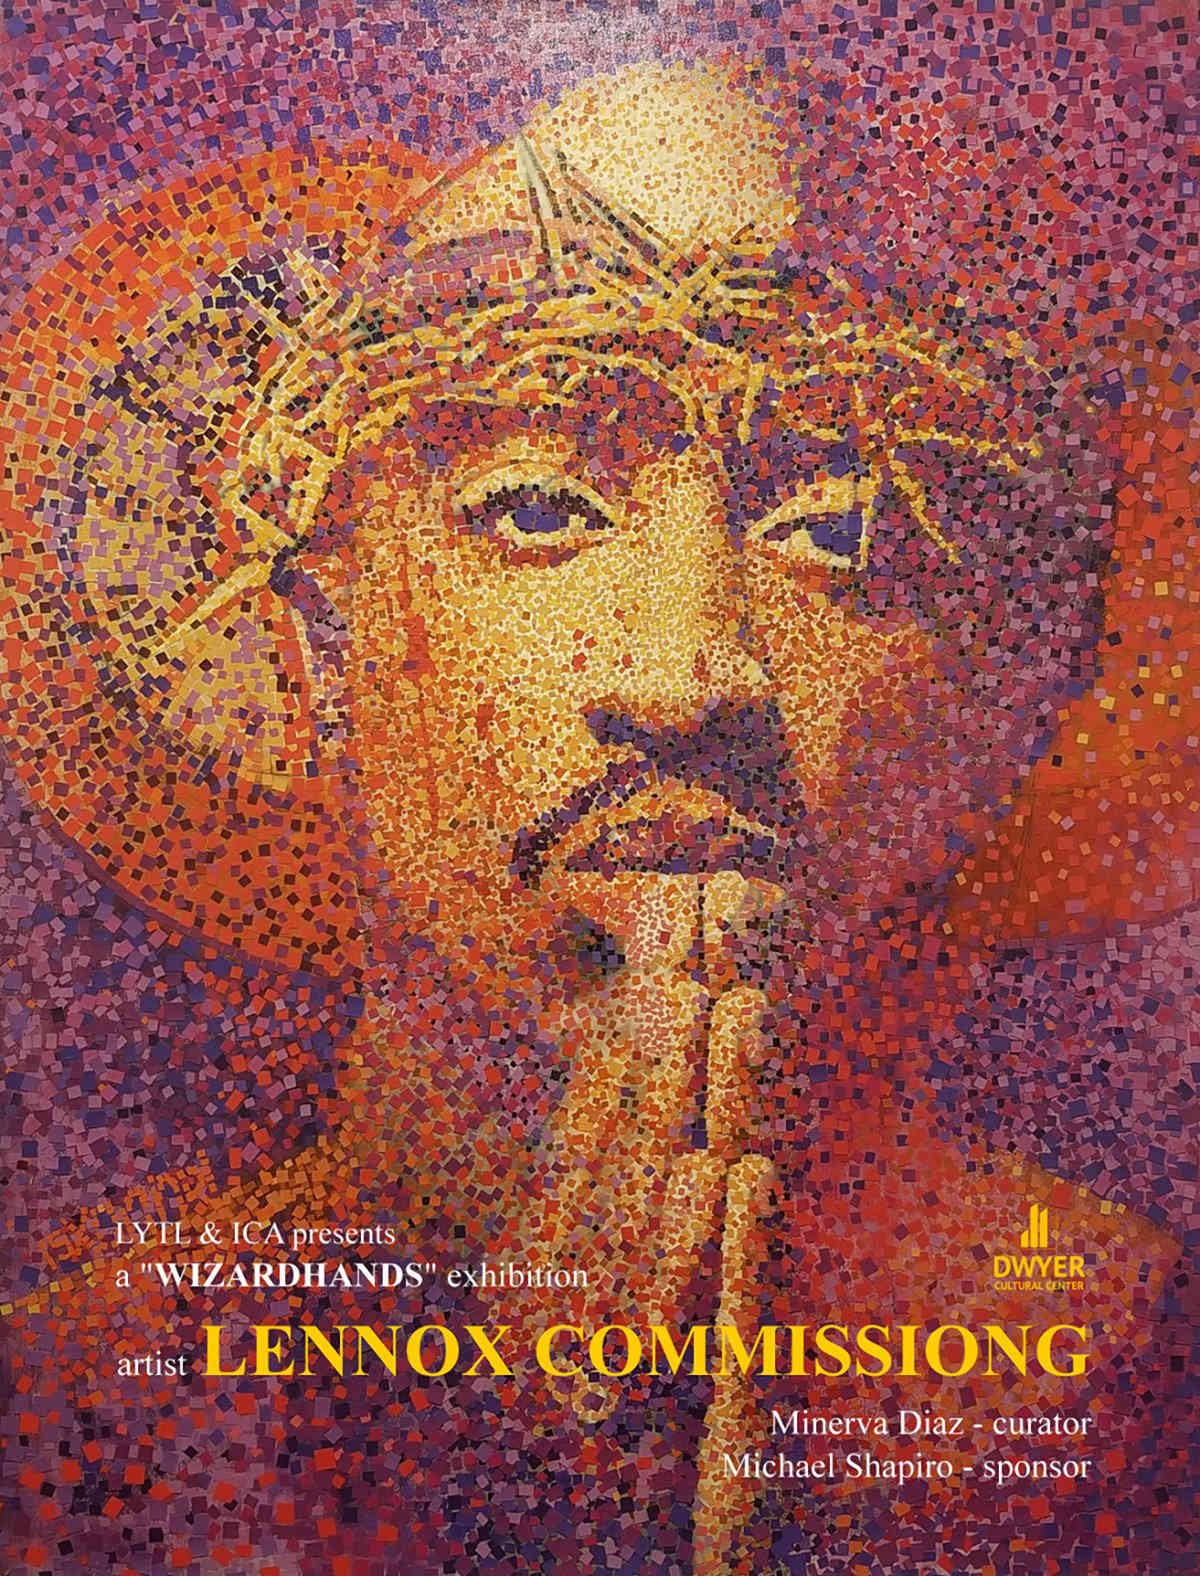 2018-07-20-nk-lennox-commissiong-pontillism-cl01_z (2).jpg